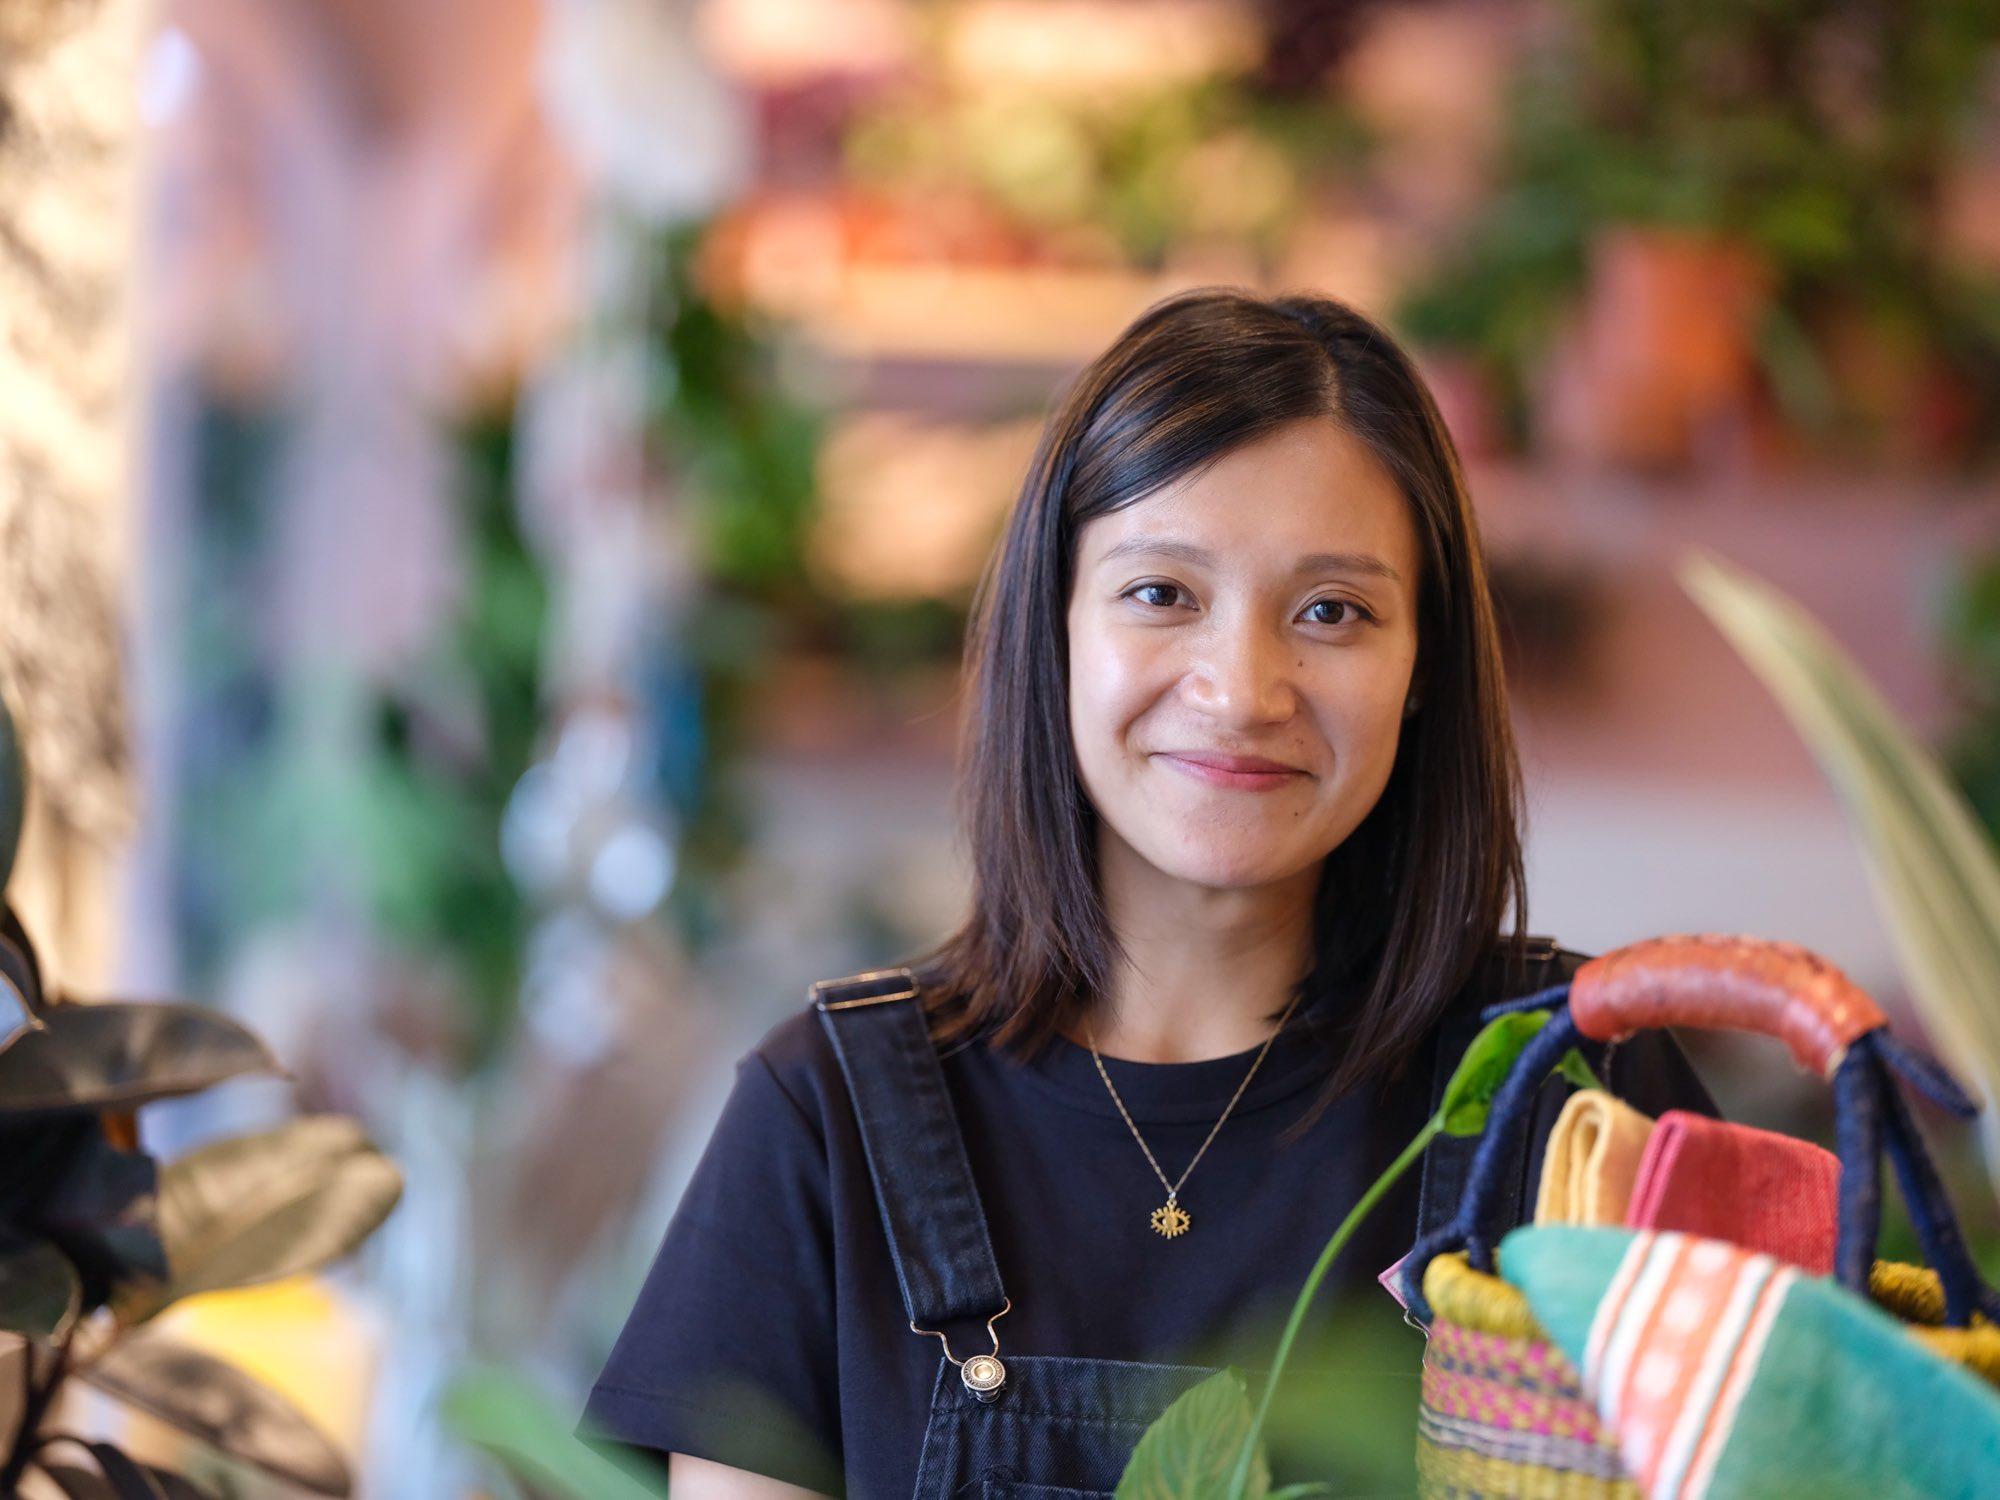 Portrait Photography Tumbleweed Shop Singapore Photographer COCO Creative Studio-3